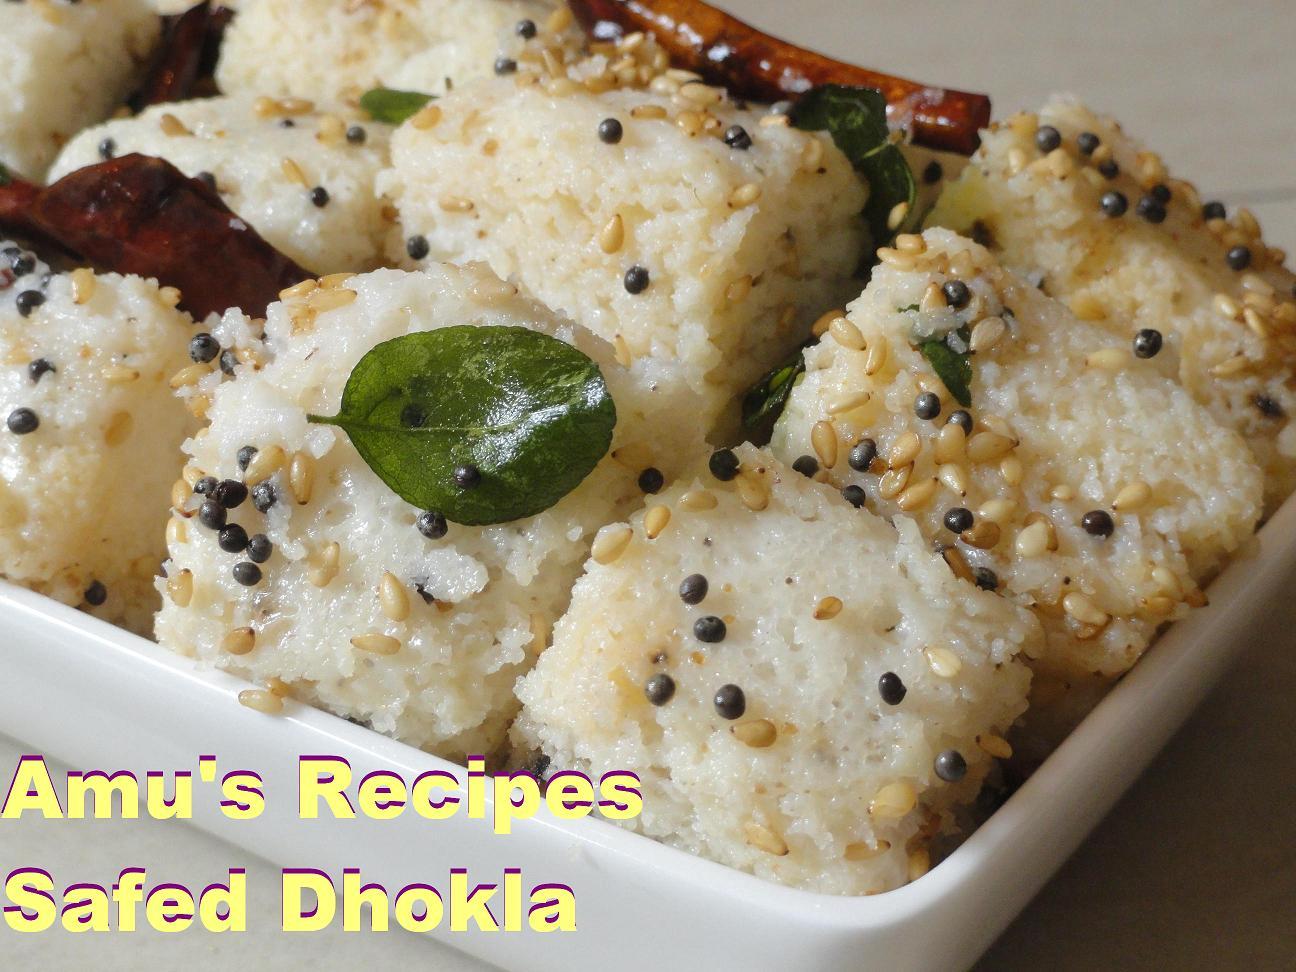 Amus recipes safed dhokla safed dhokla forumfinder Gallery